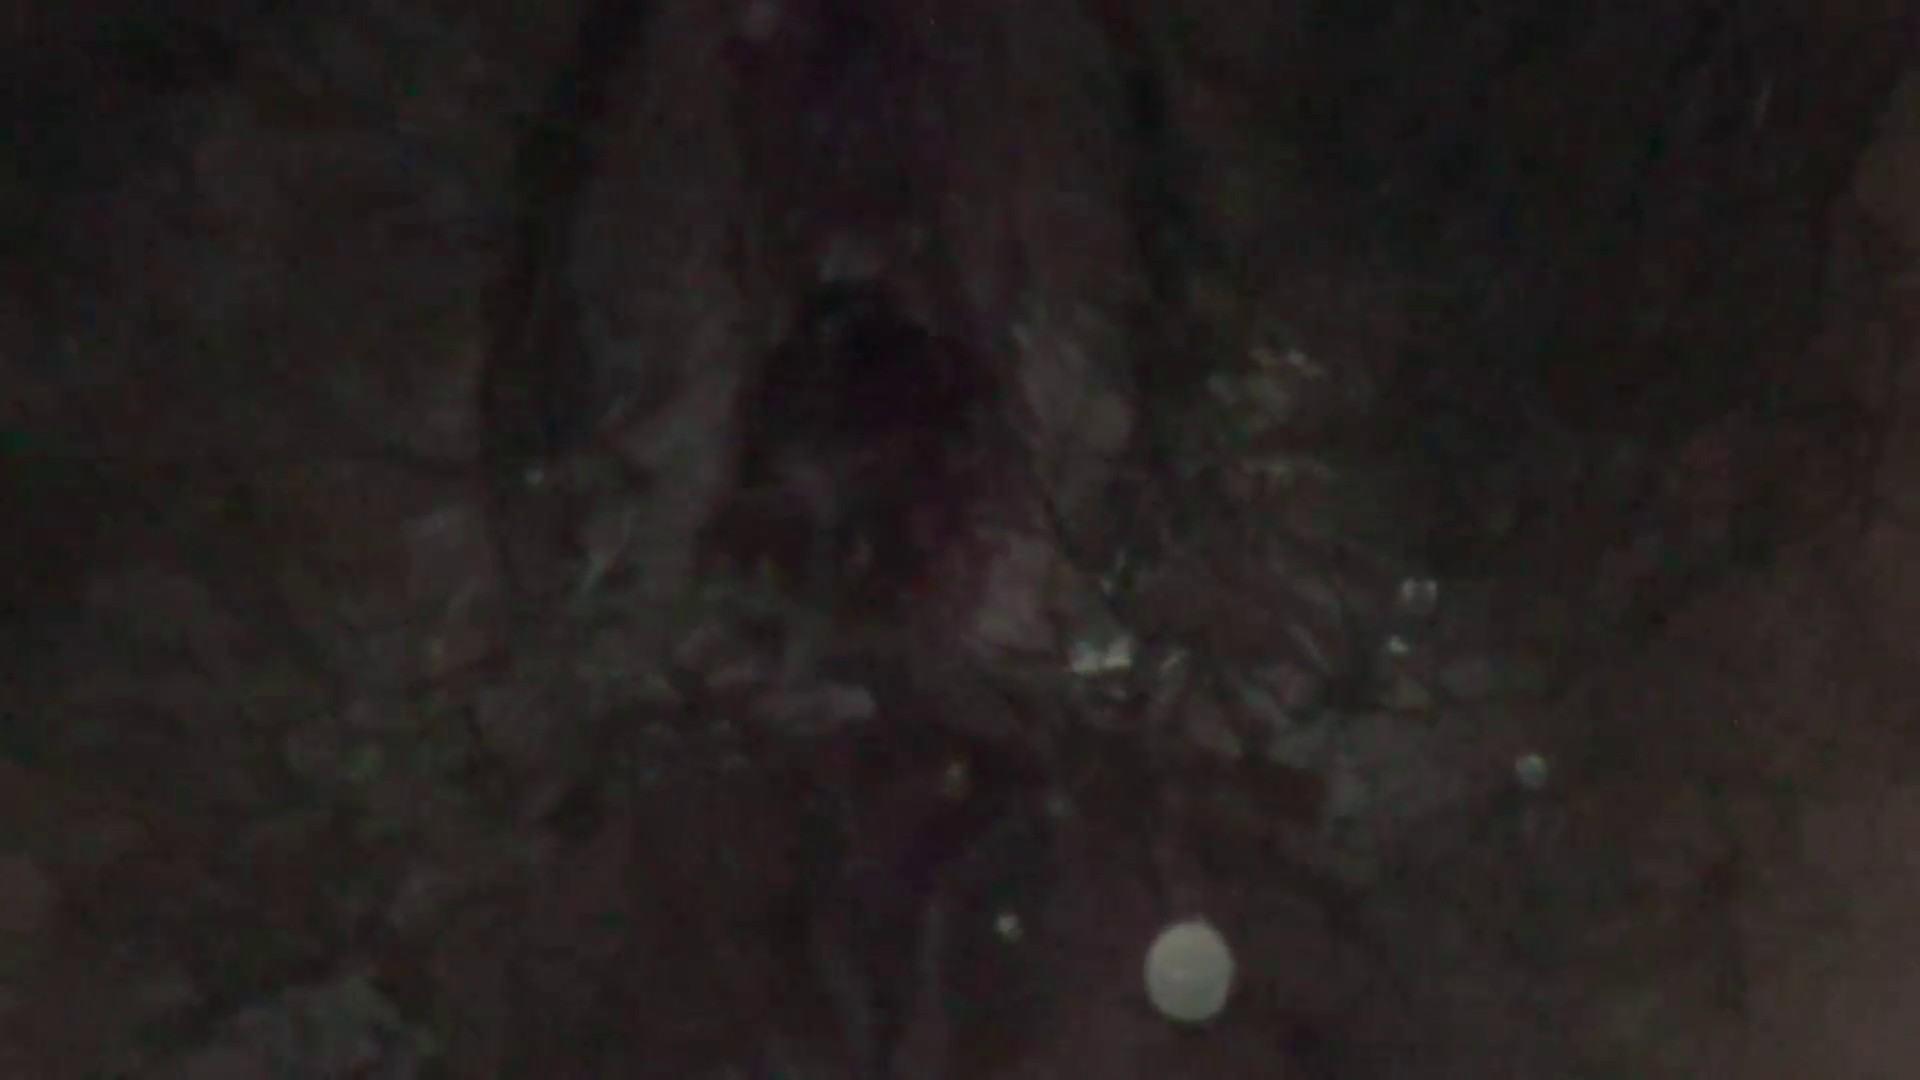 JD盗撮 美女の洗面所の秘密 Vol.28 美肌 おめこ無修正画像 71画像 71